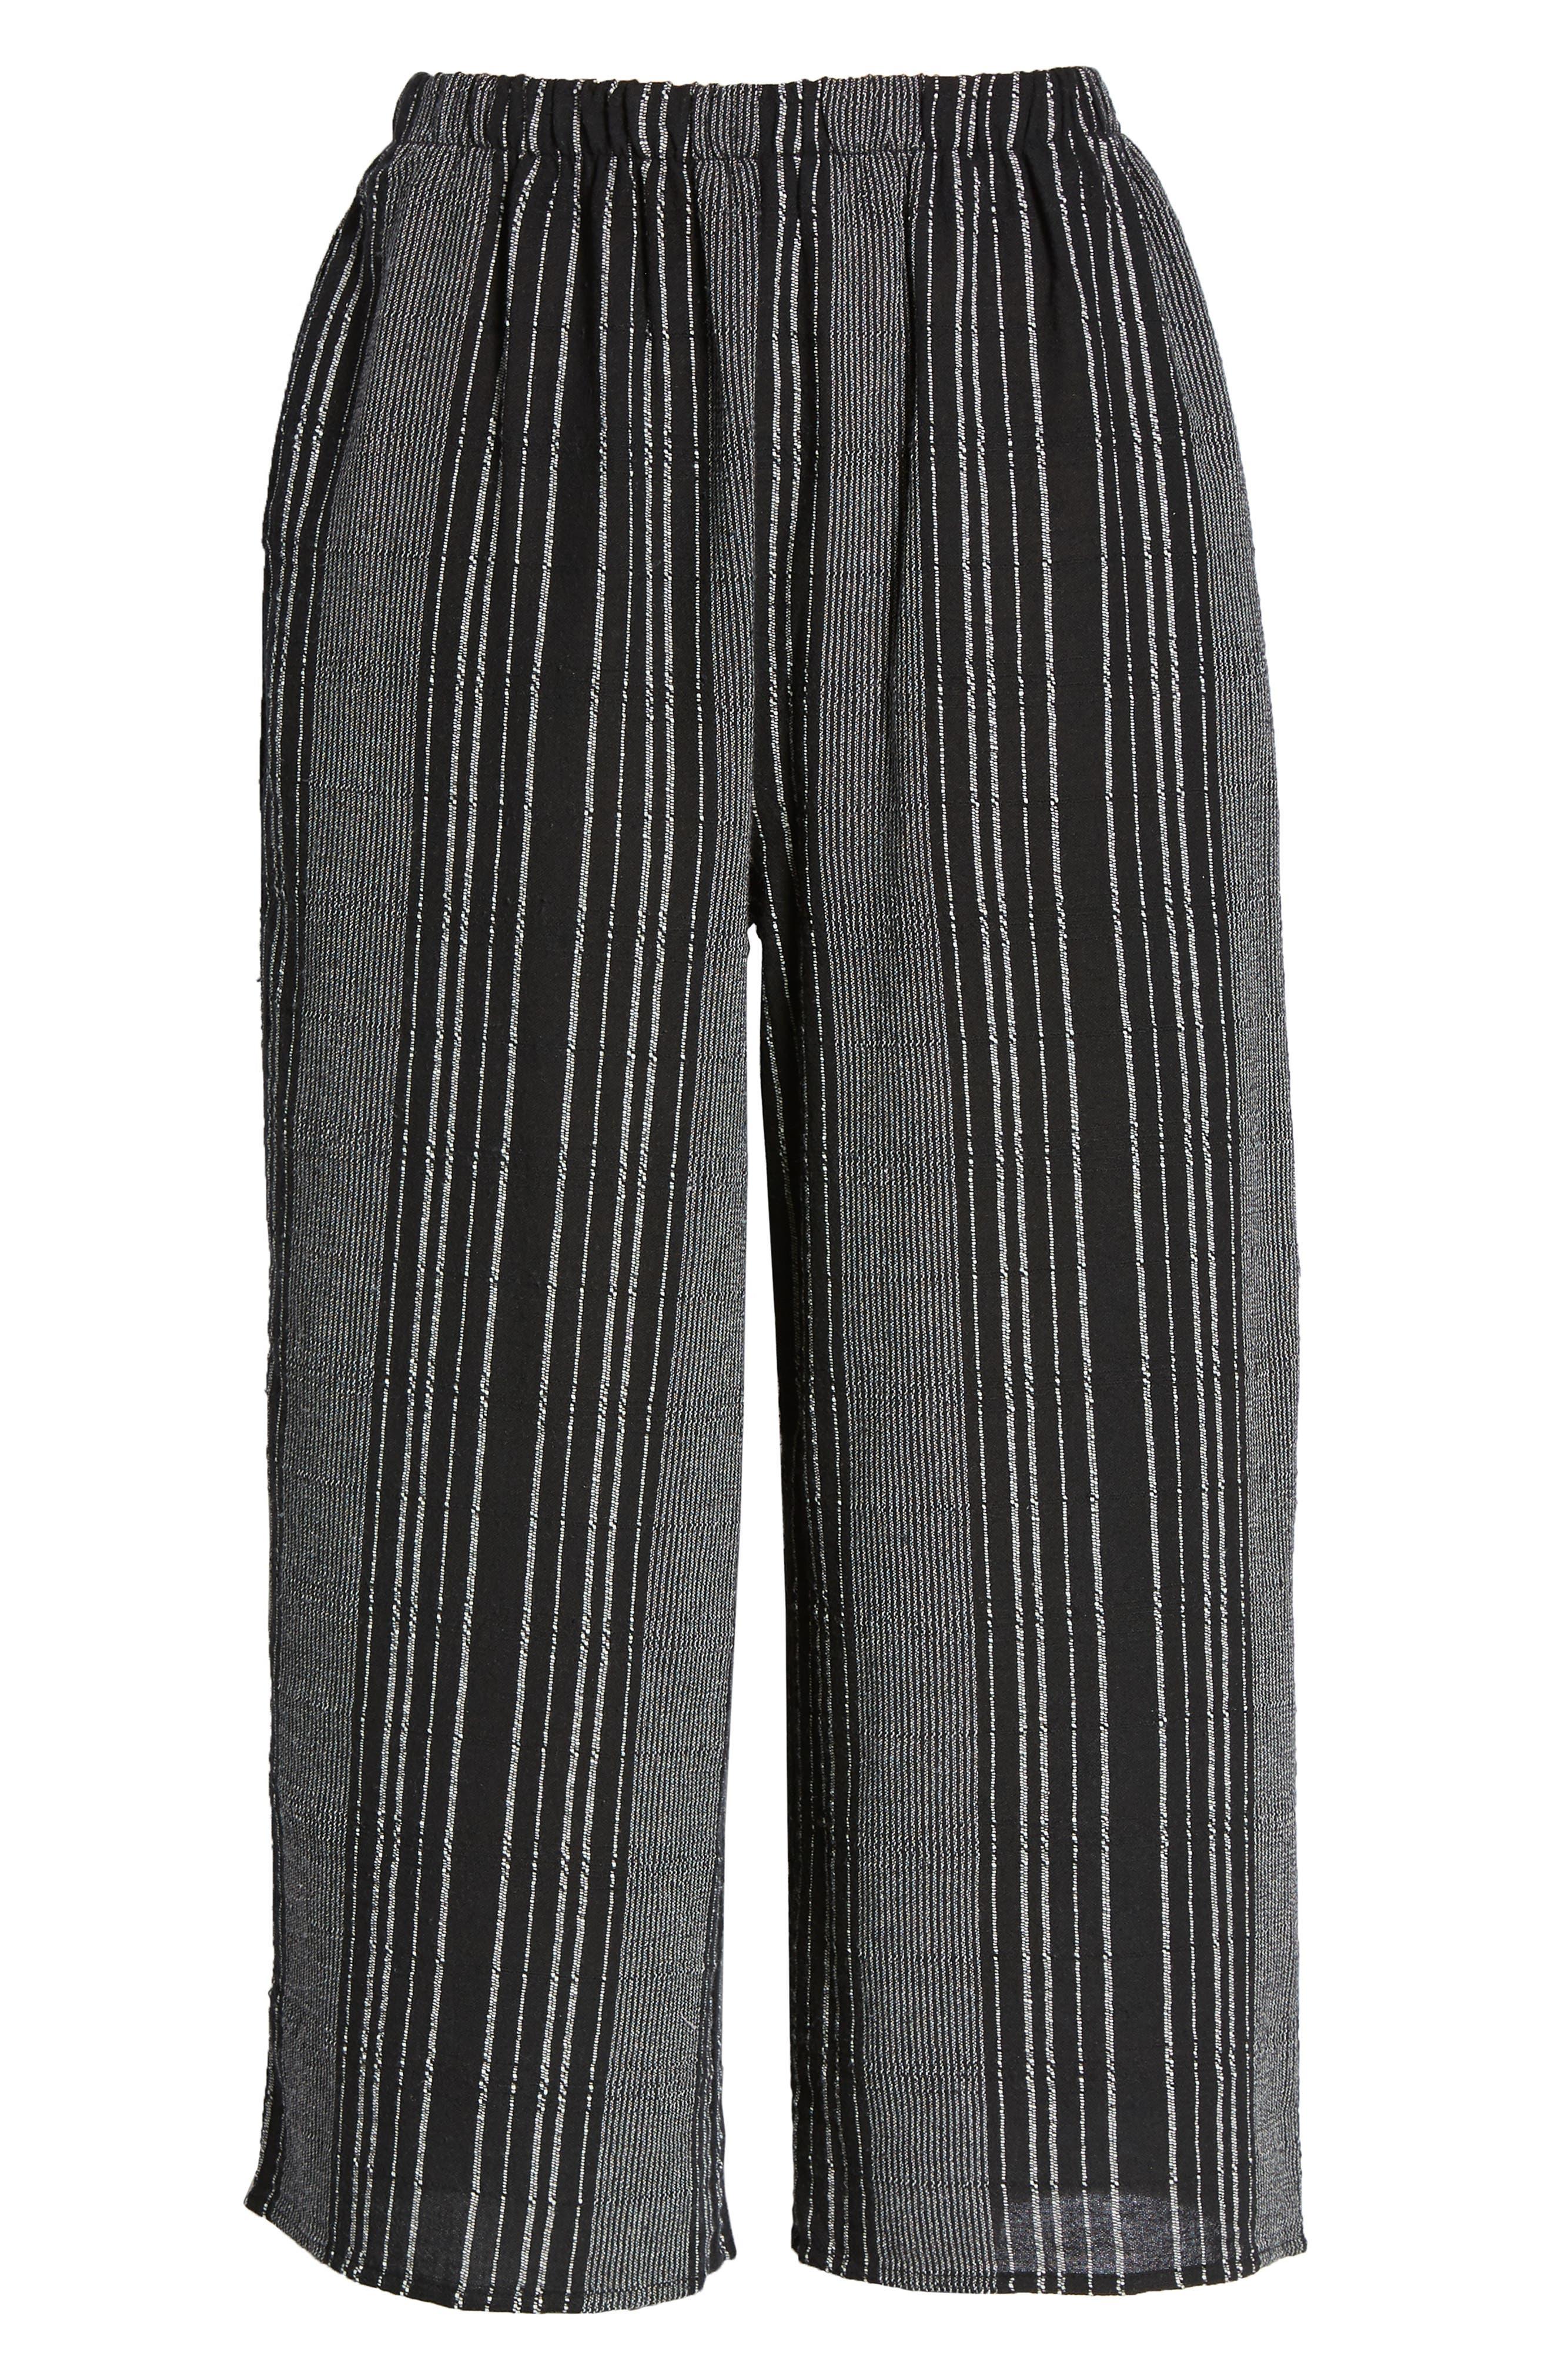 Bella Stripe Crop Pants,                             Alternate thumbnail 8, color,                             Black